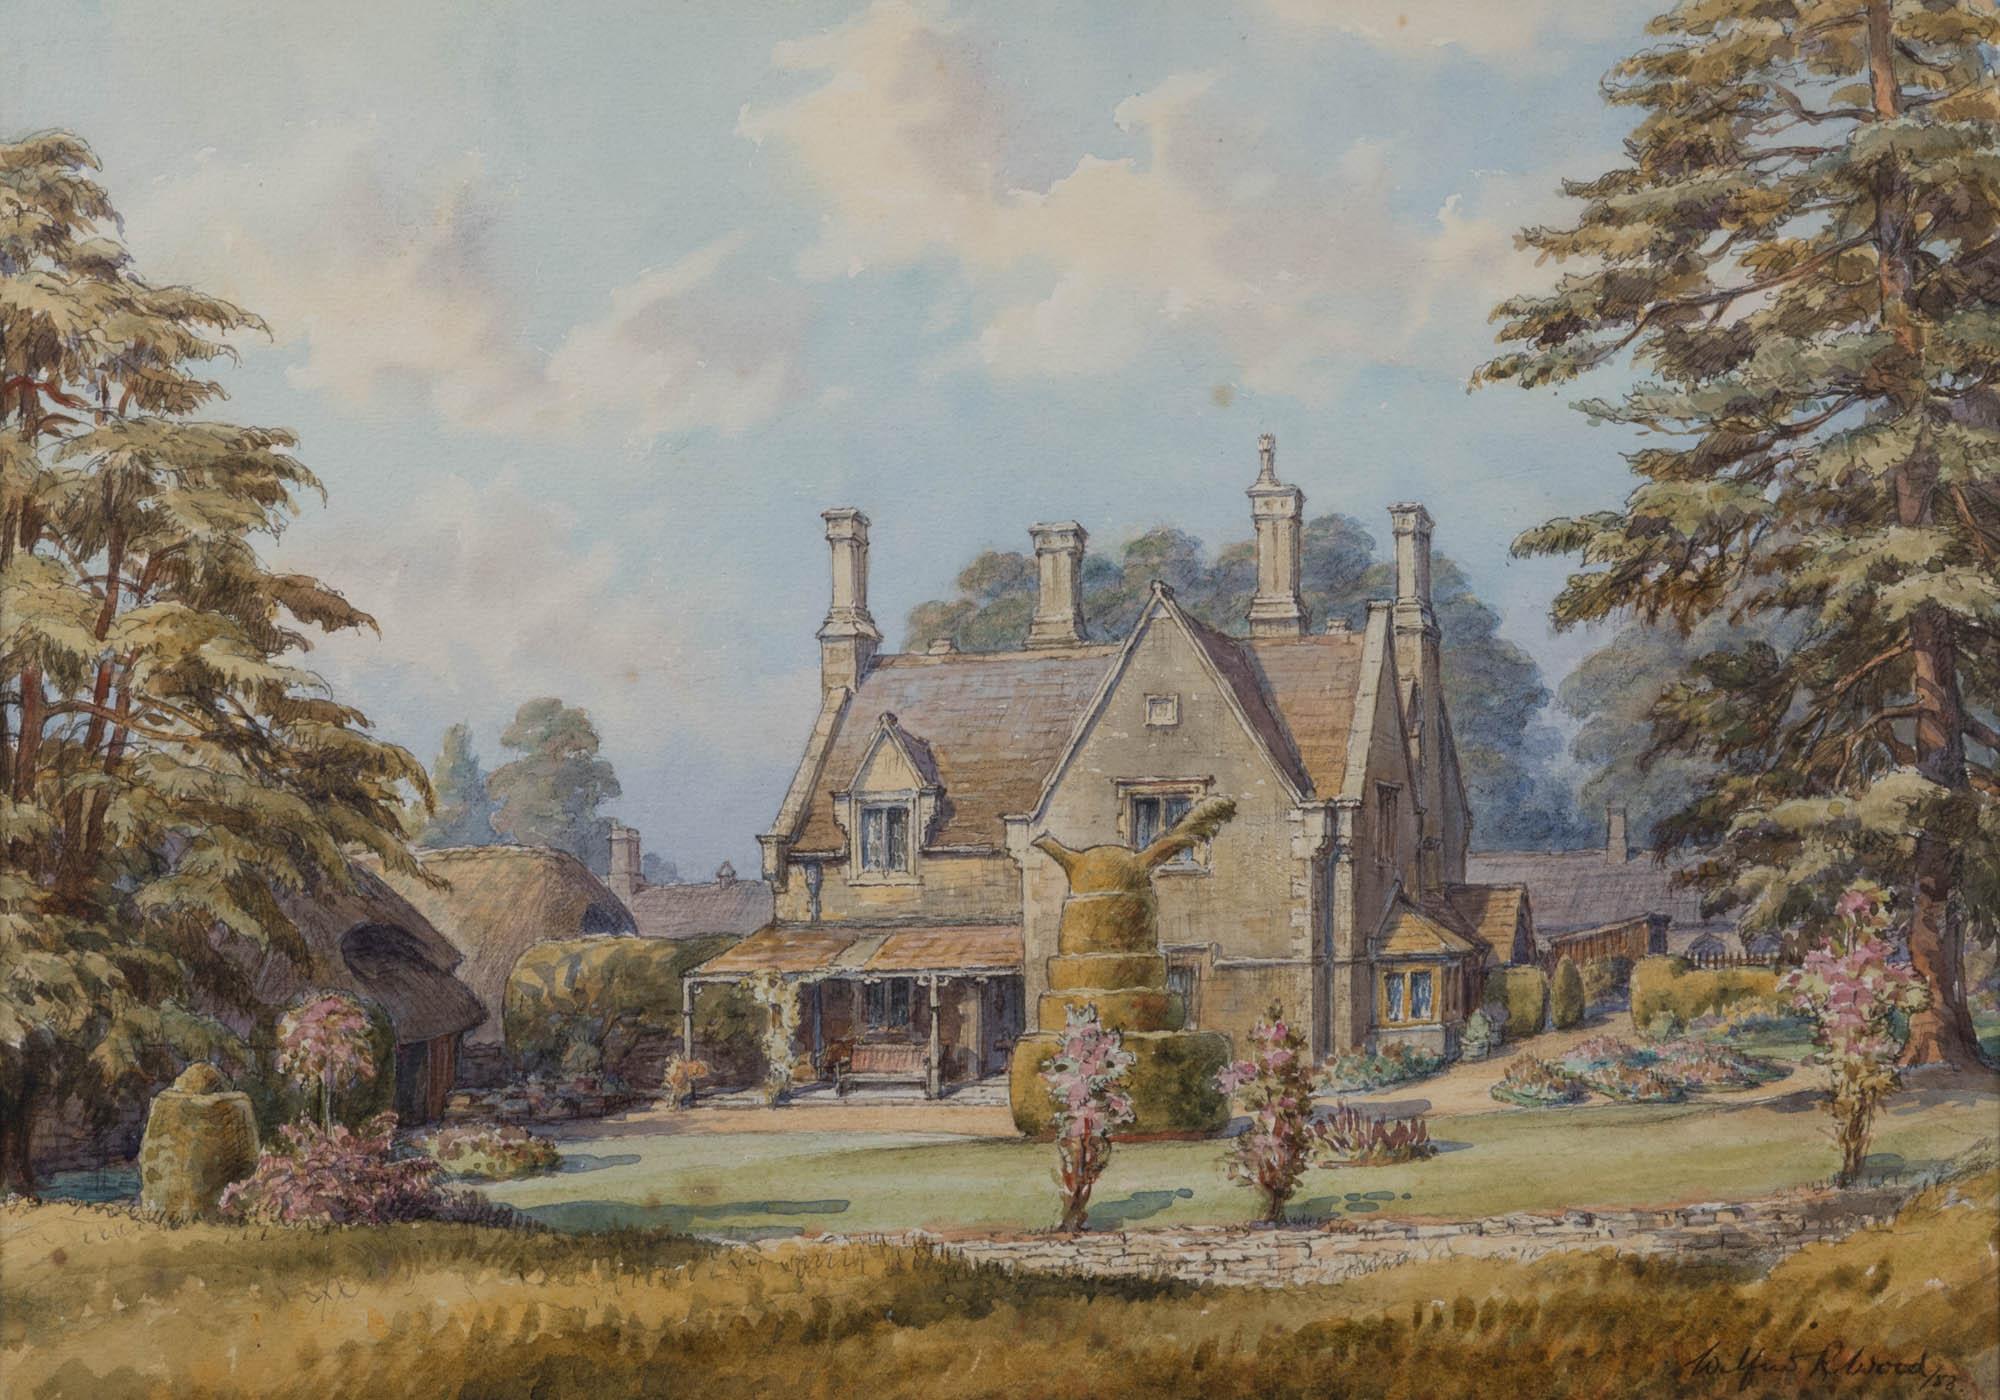 The Dairy Farm, by Wilfrid Reni Wood (1888-1976).